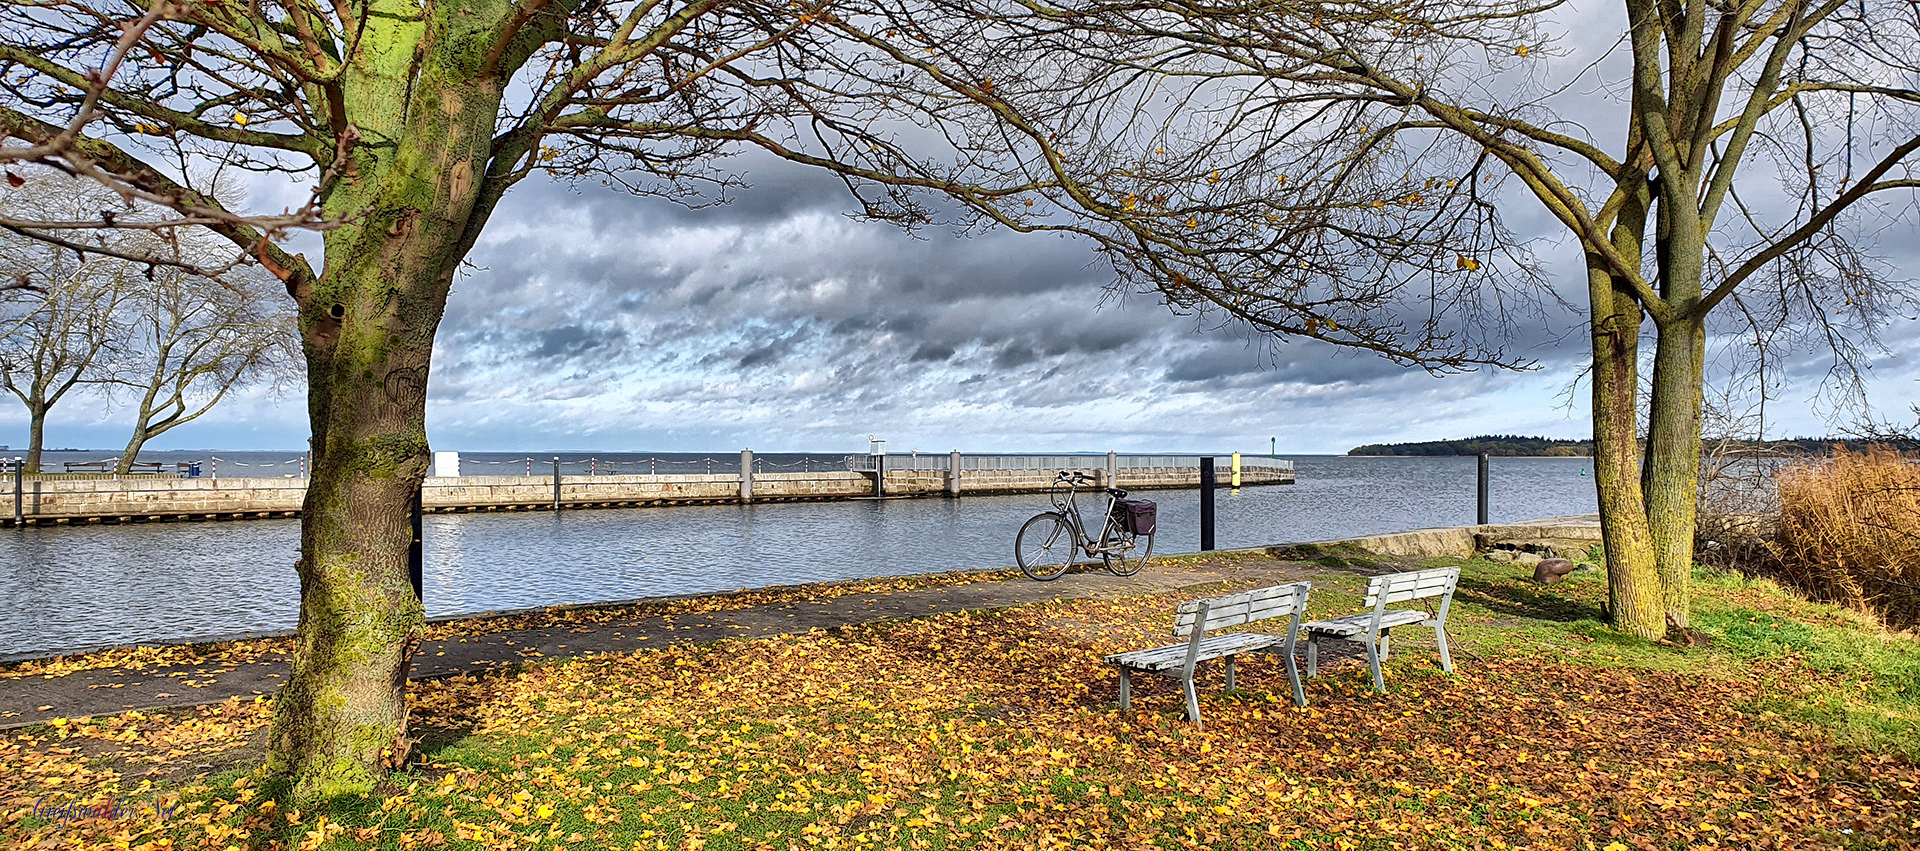 Herbstmomente in Greifswald-Wieck